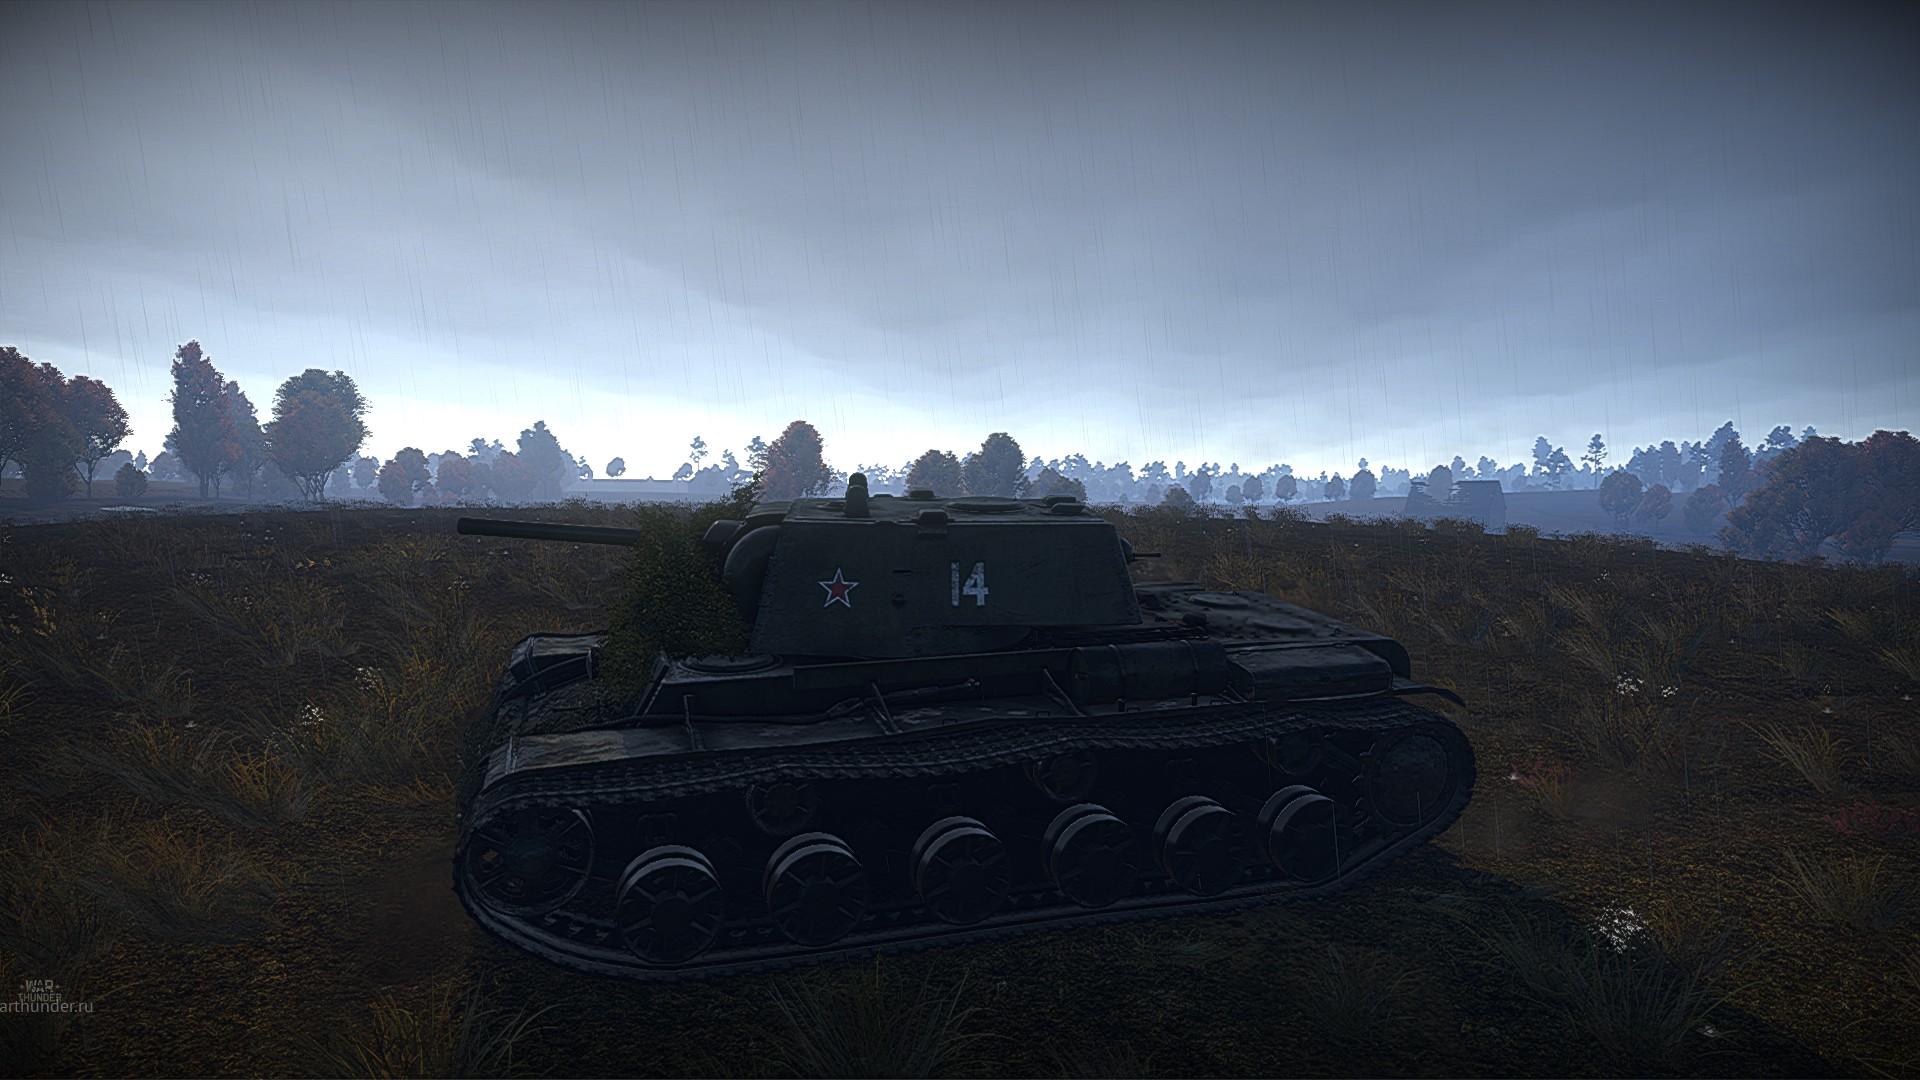 shot 2018.11.16 18.40.34.jpg - War Thunder